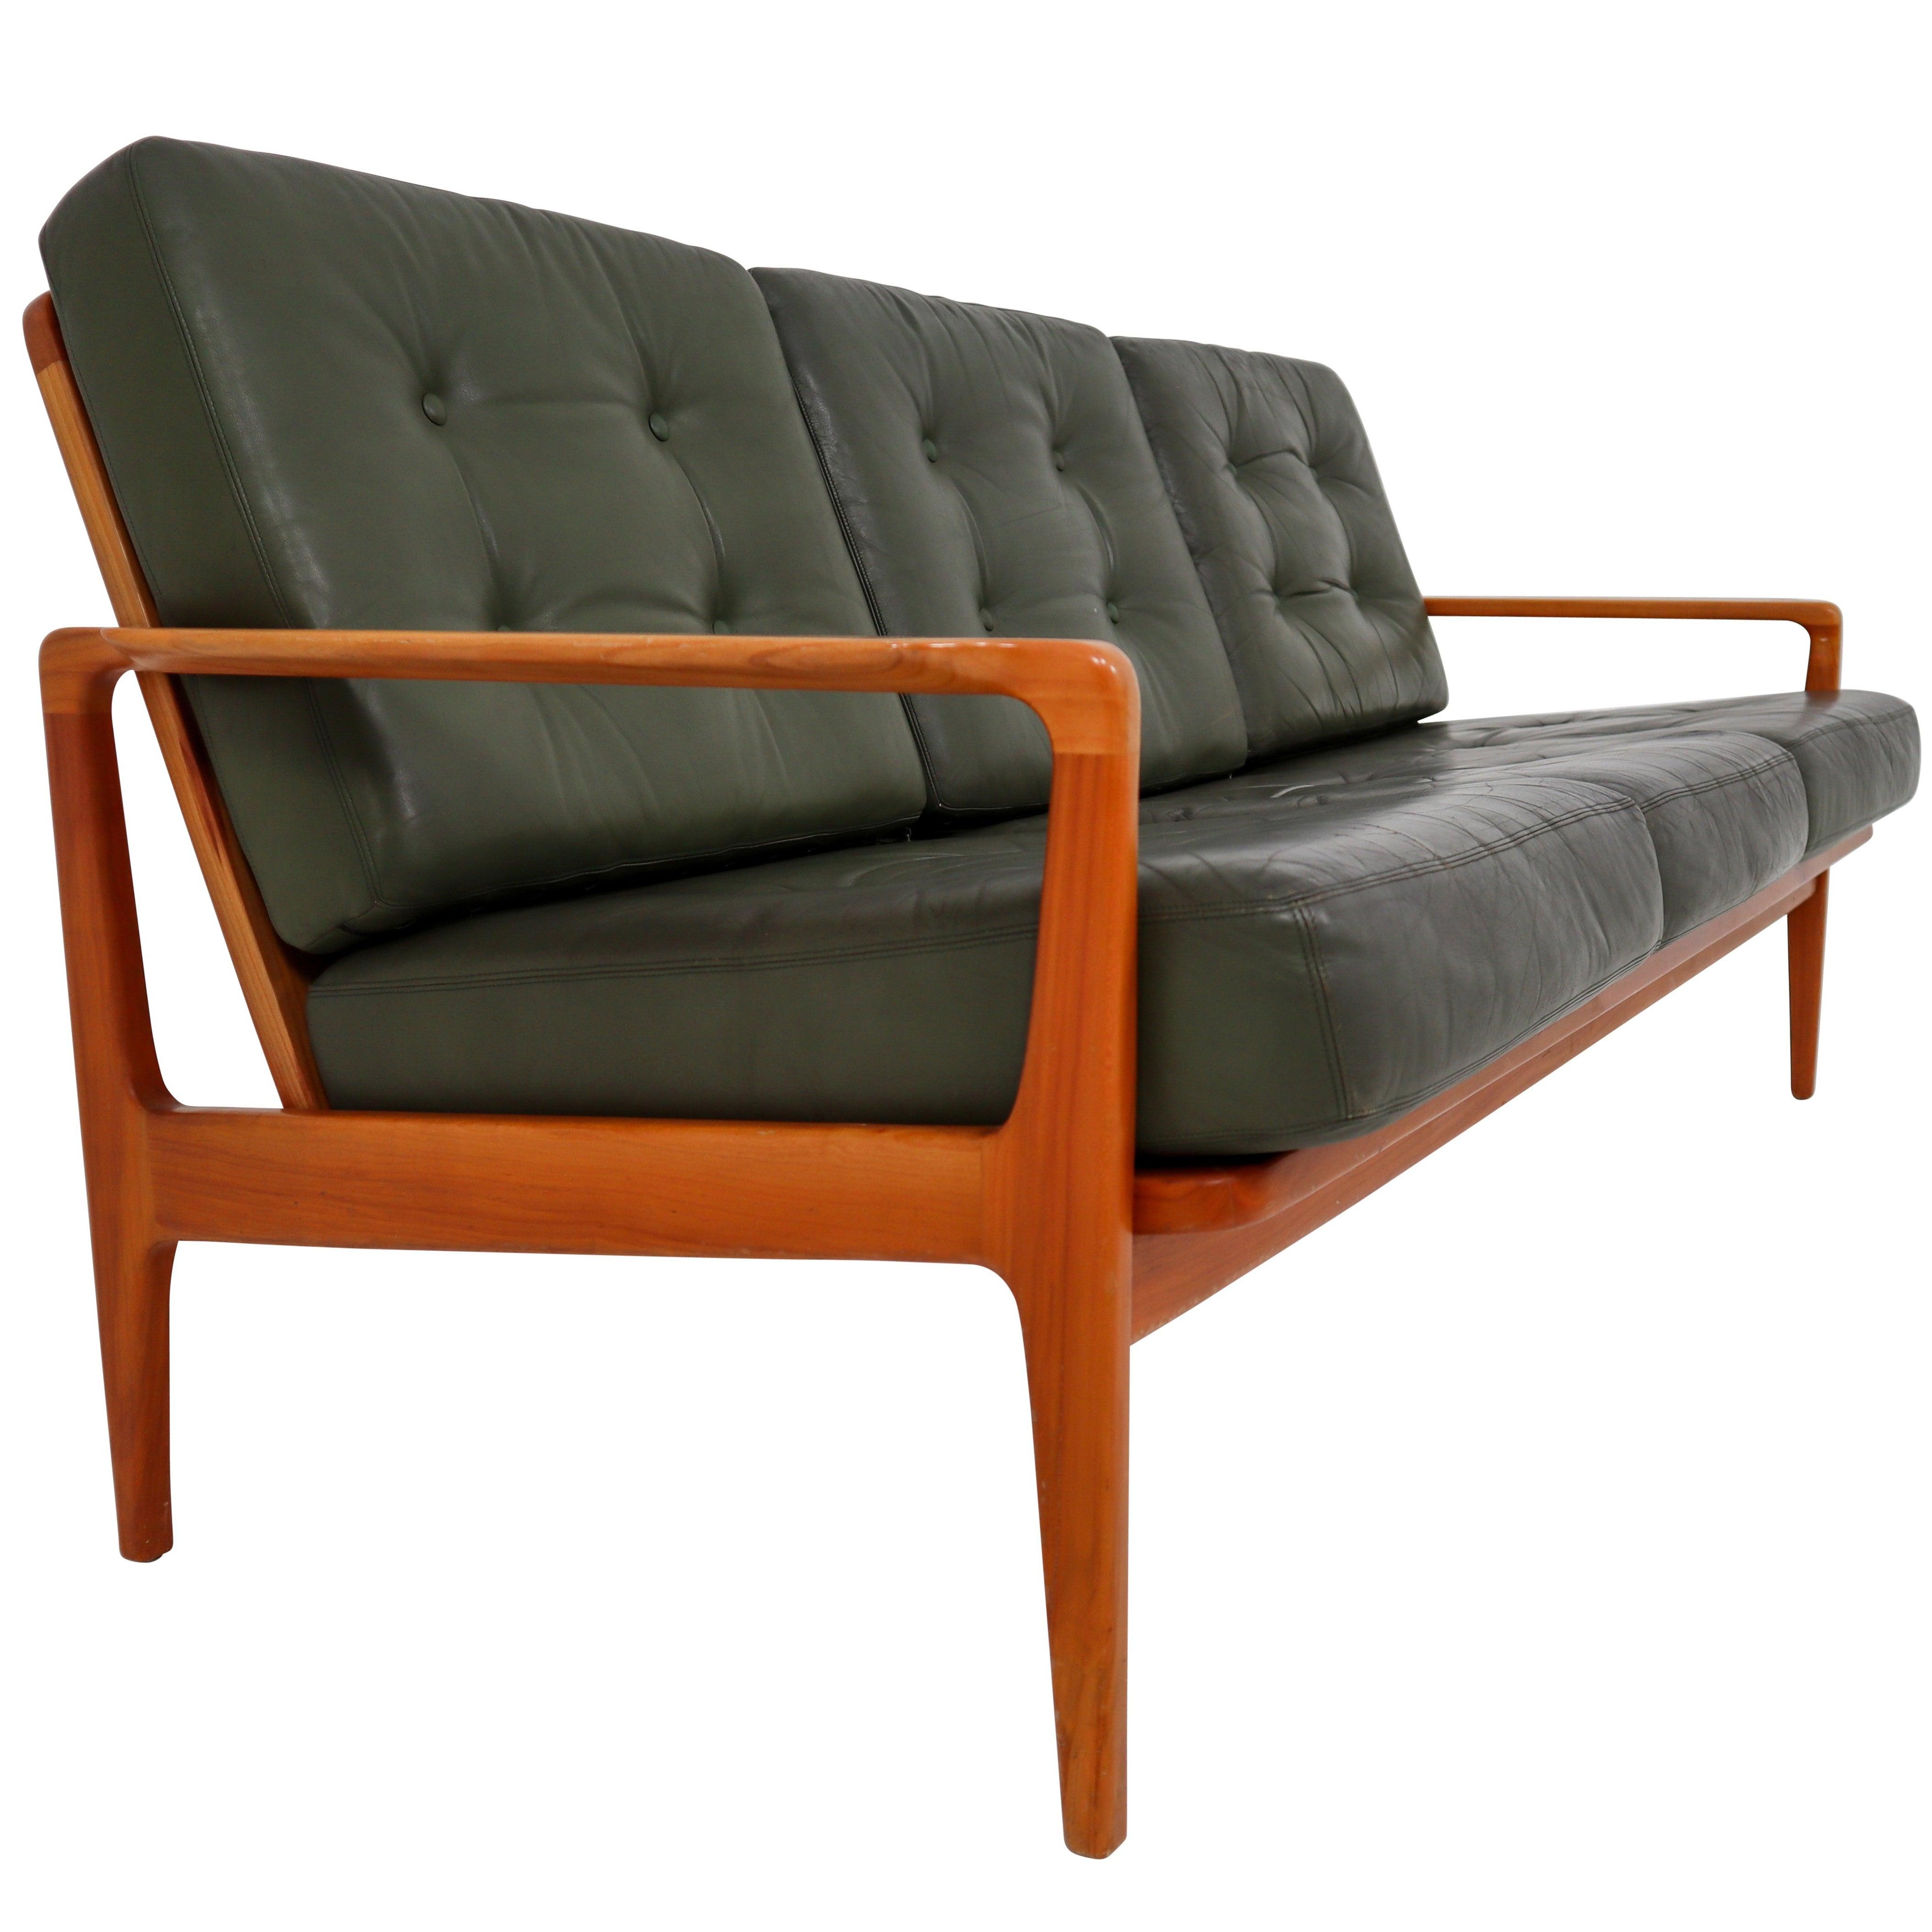 Midcentury Danish Three-Seat Sofa by Arne Wahl Iversen, Denmark, 1960s